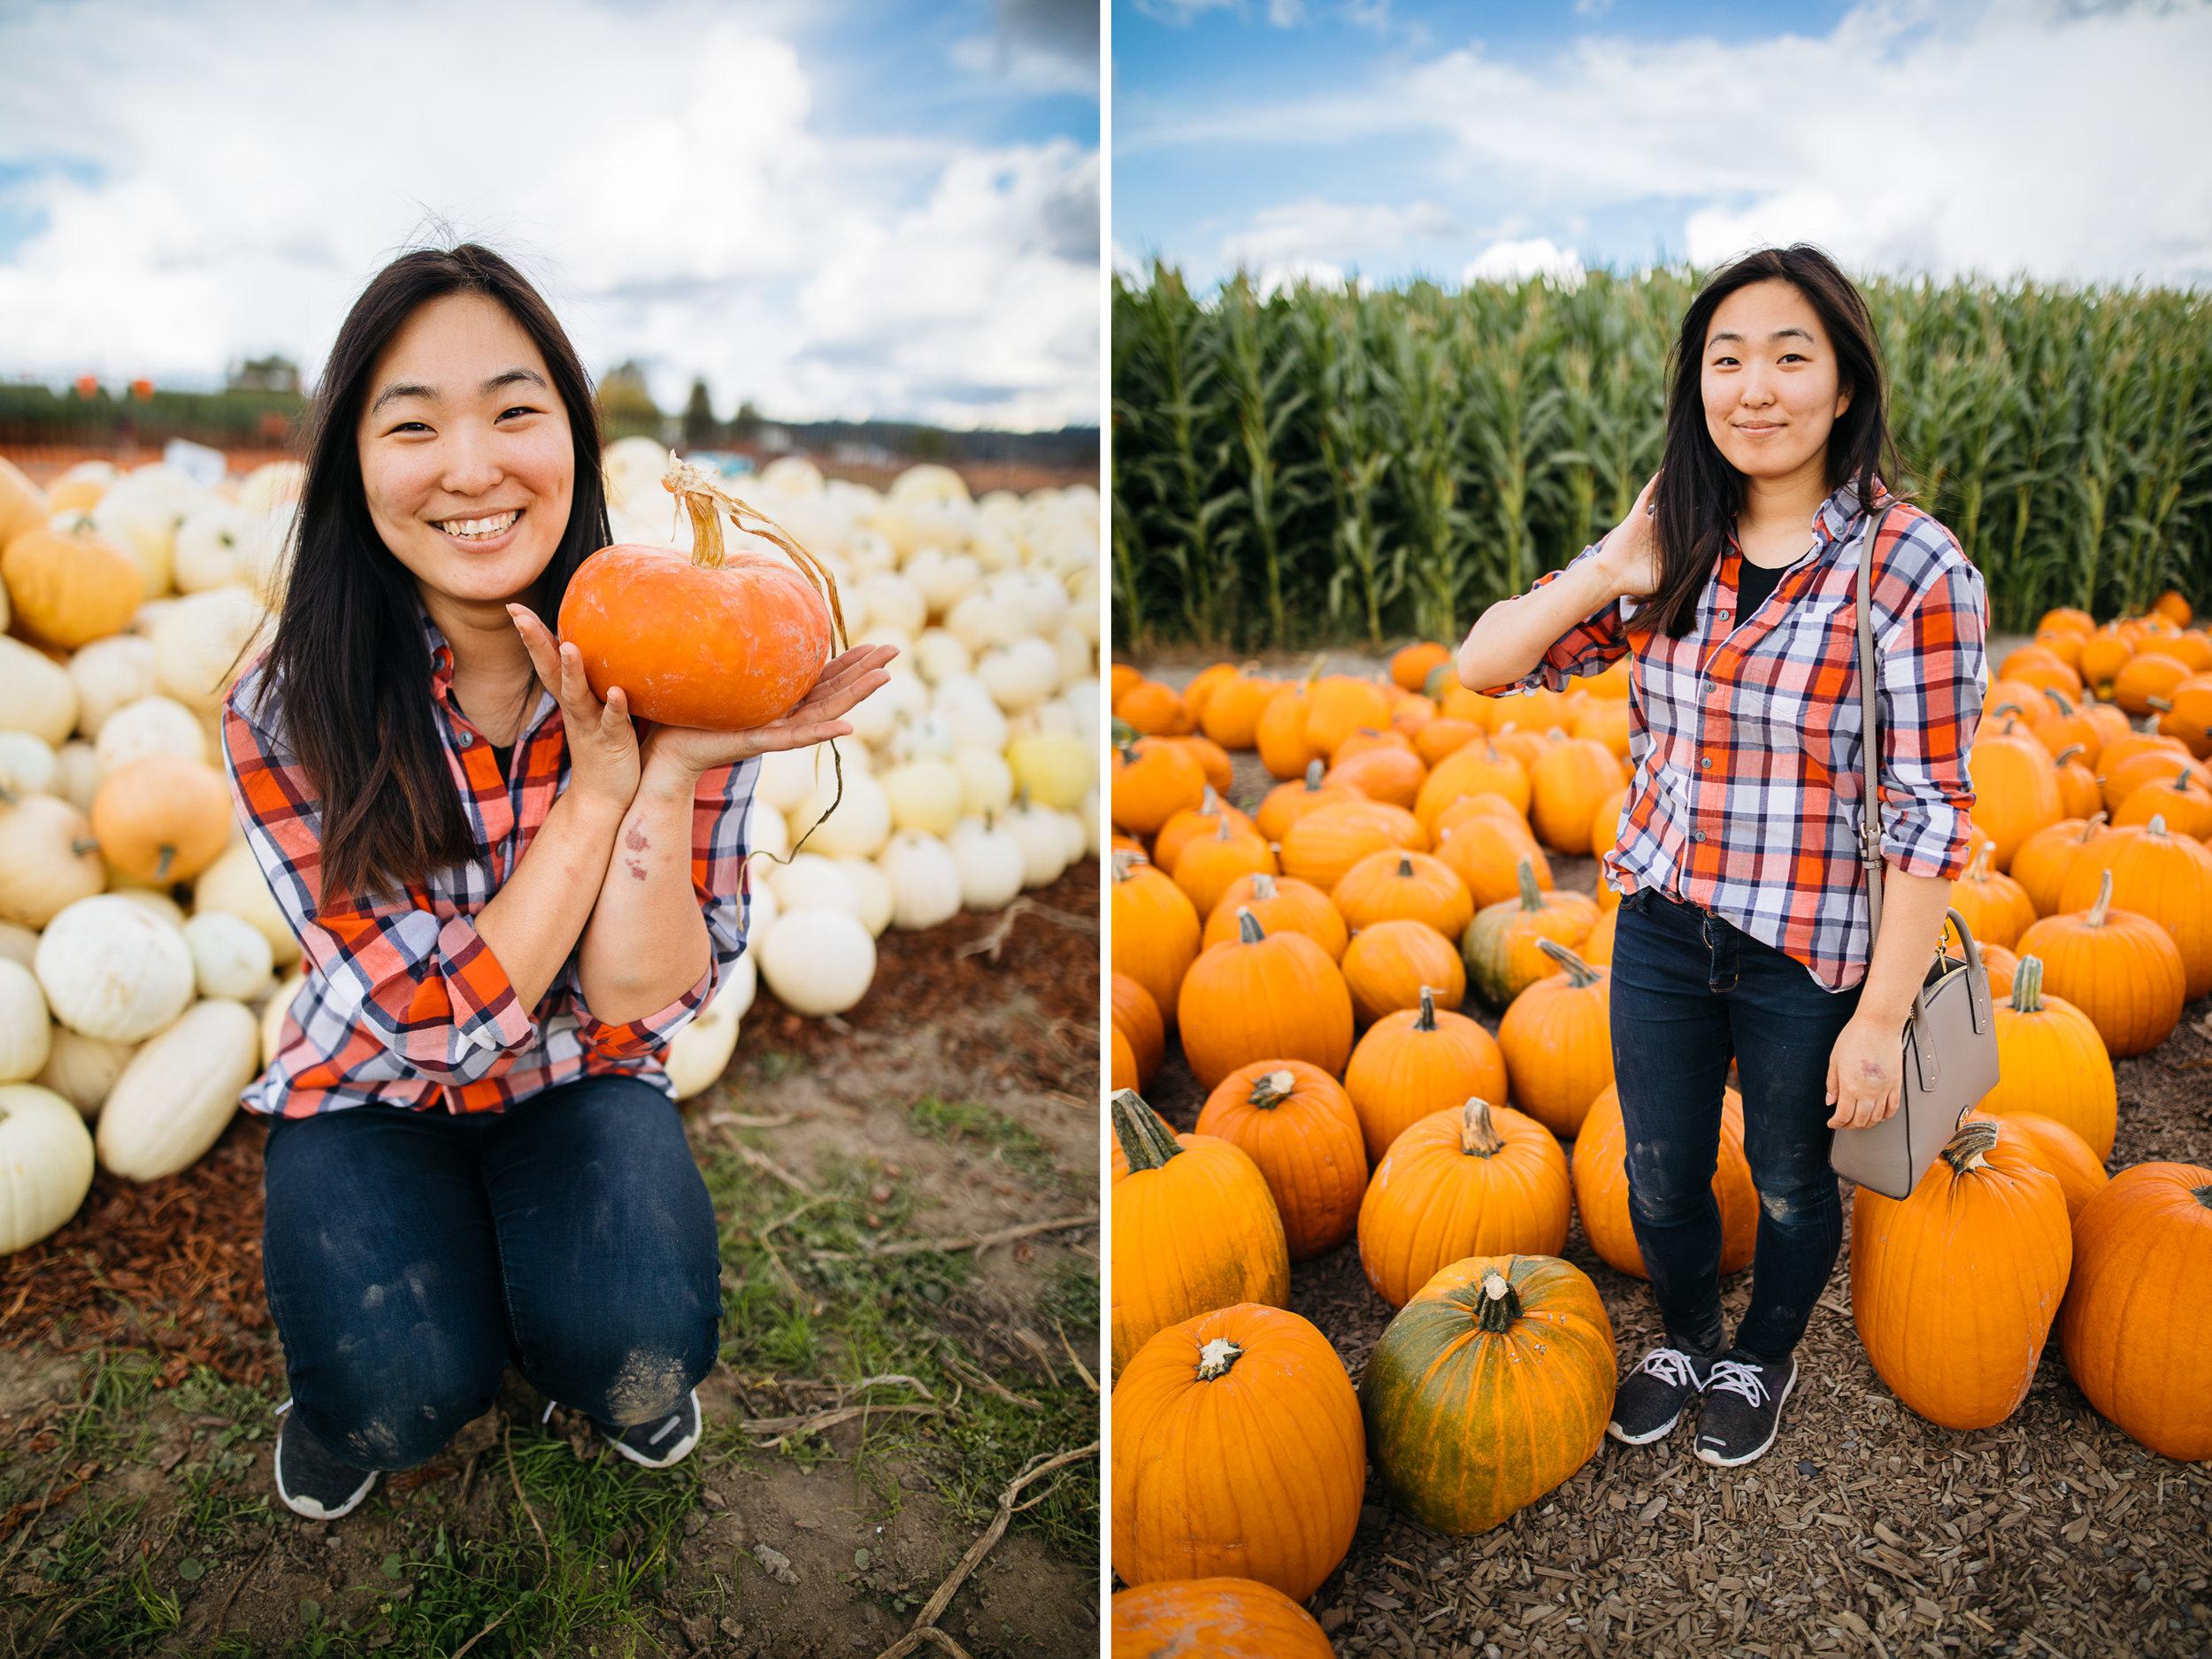 10-11-2017 Susan Kwon Blog Diptych 2.jpg